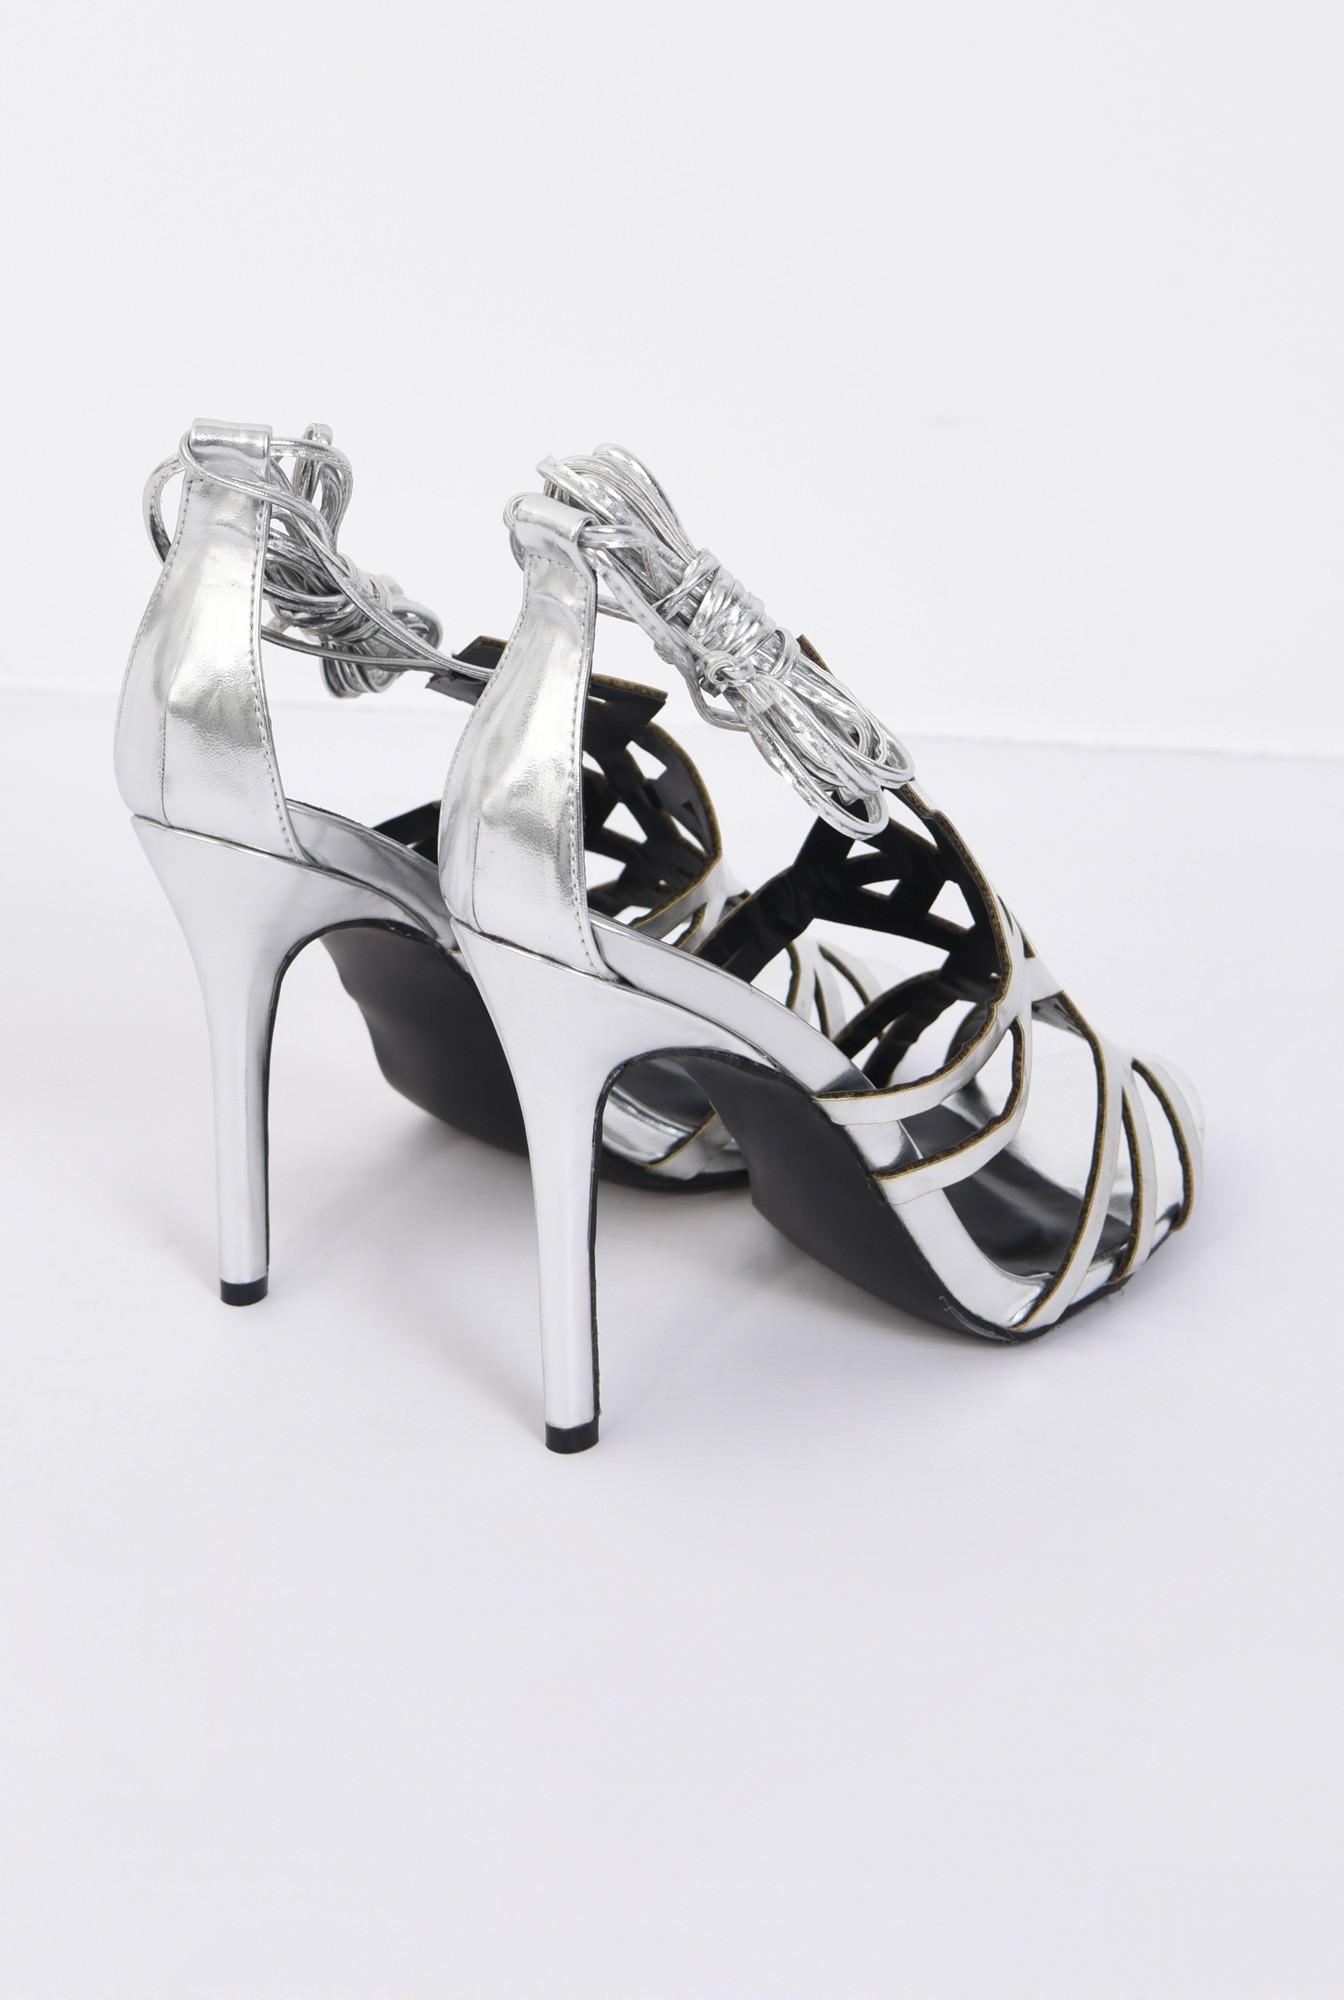 3 - sandale elegante, argintii, metalizate, stiletto